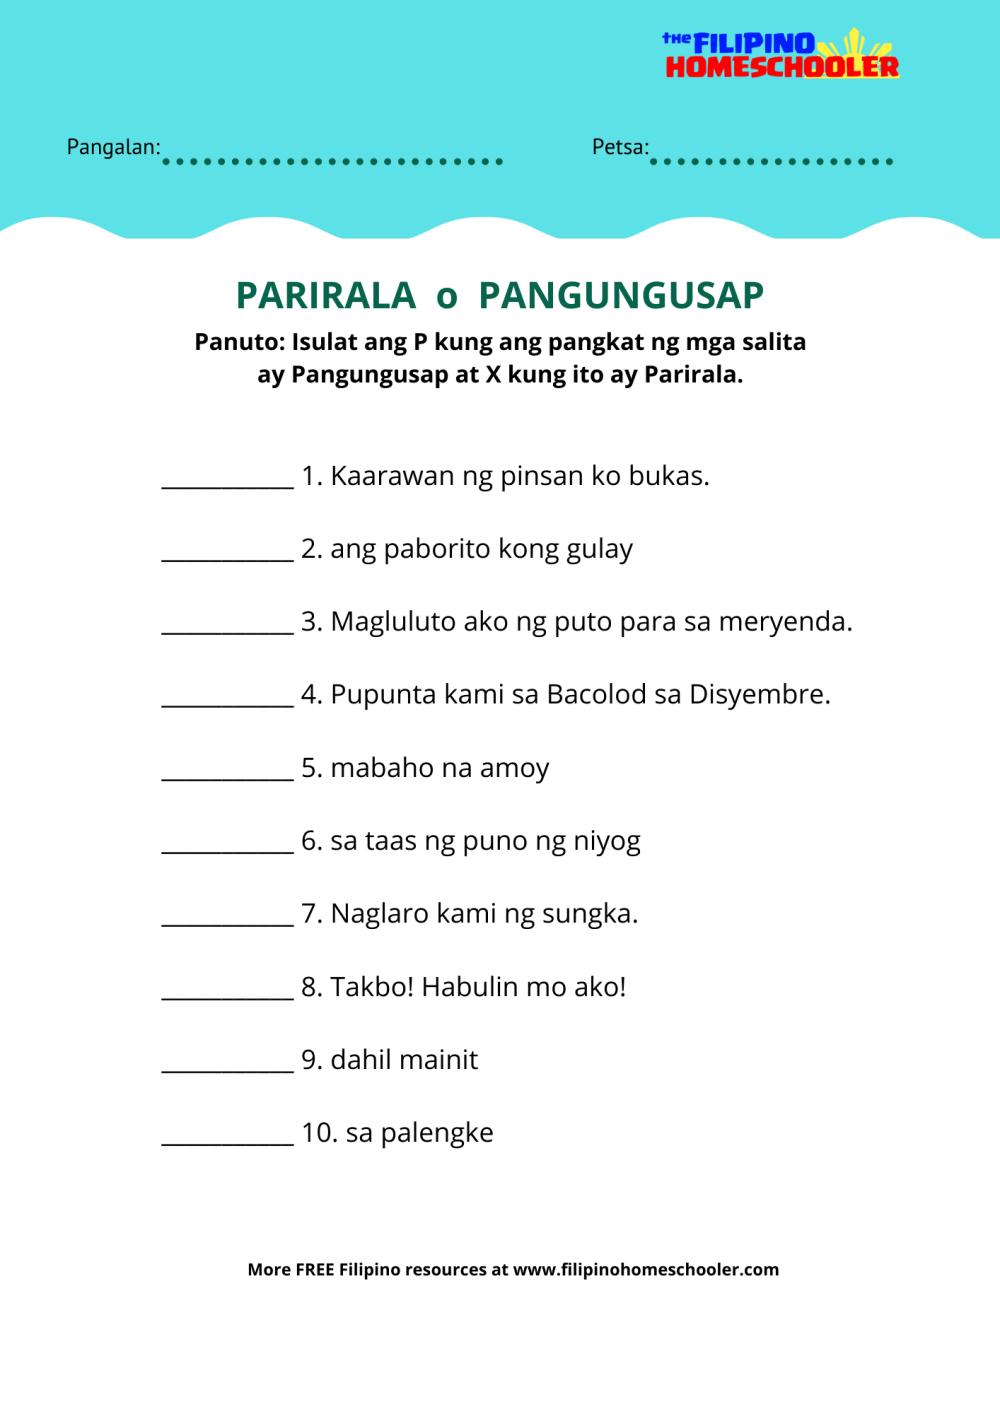 medium resolution of Uri Ng Panghalip Worksheet   Printable Worksheets and Activities for  Teachers